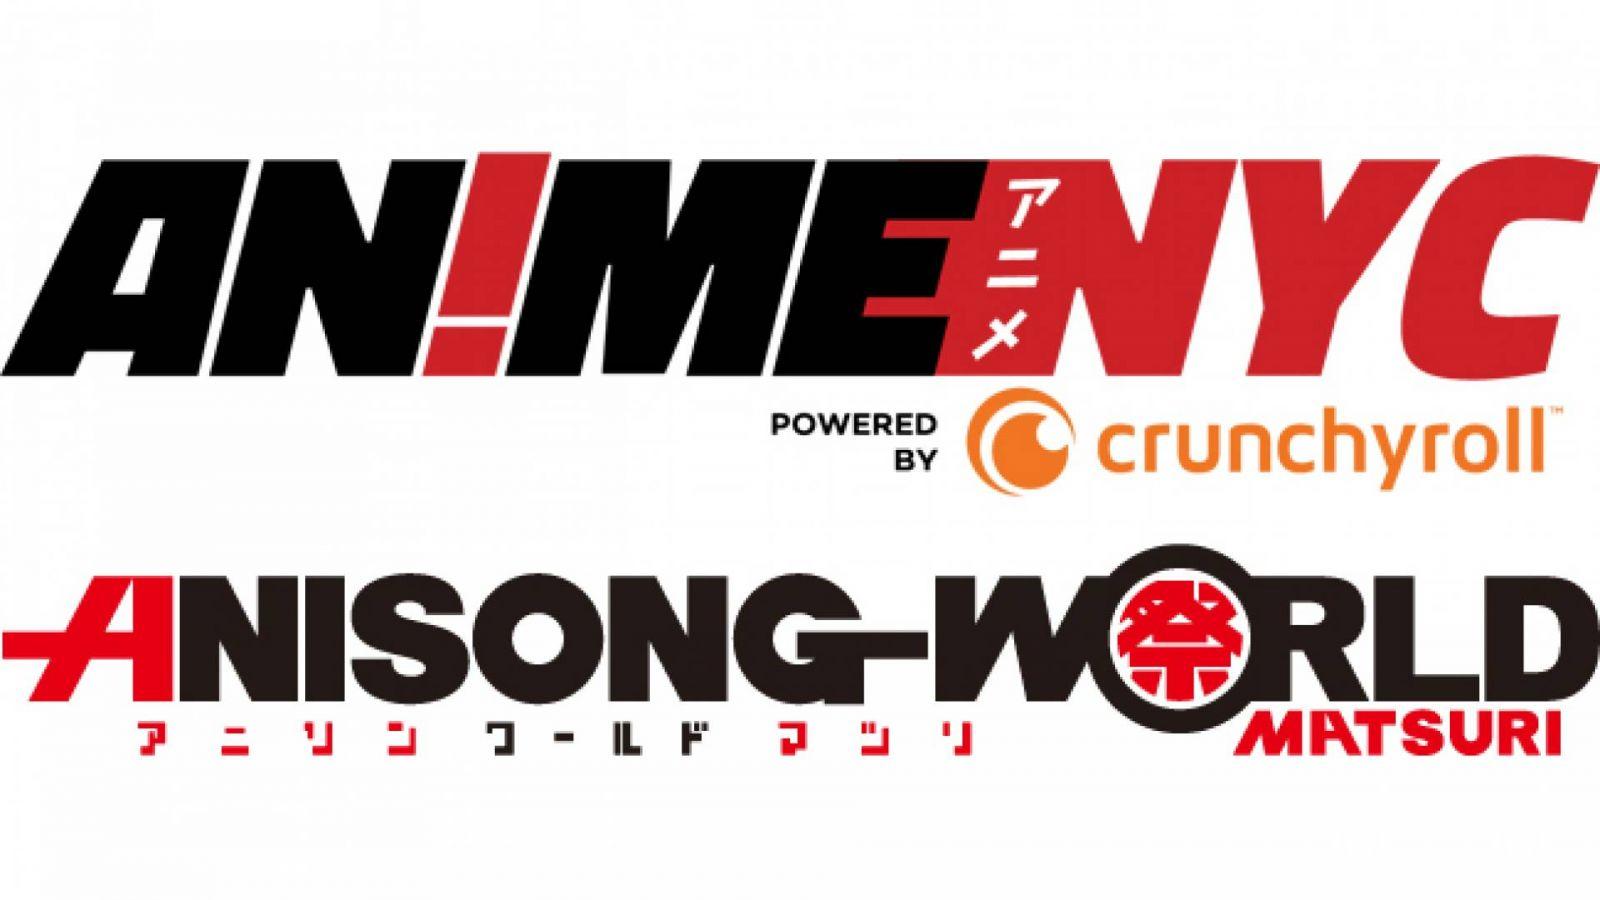 Anisong World Matsuri to Debut at Anime NYC © Anime NYC / Anisong World Matsuri